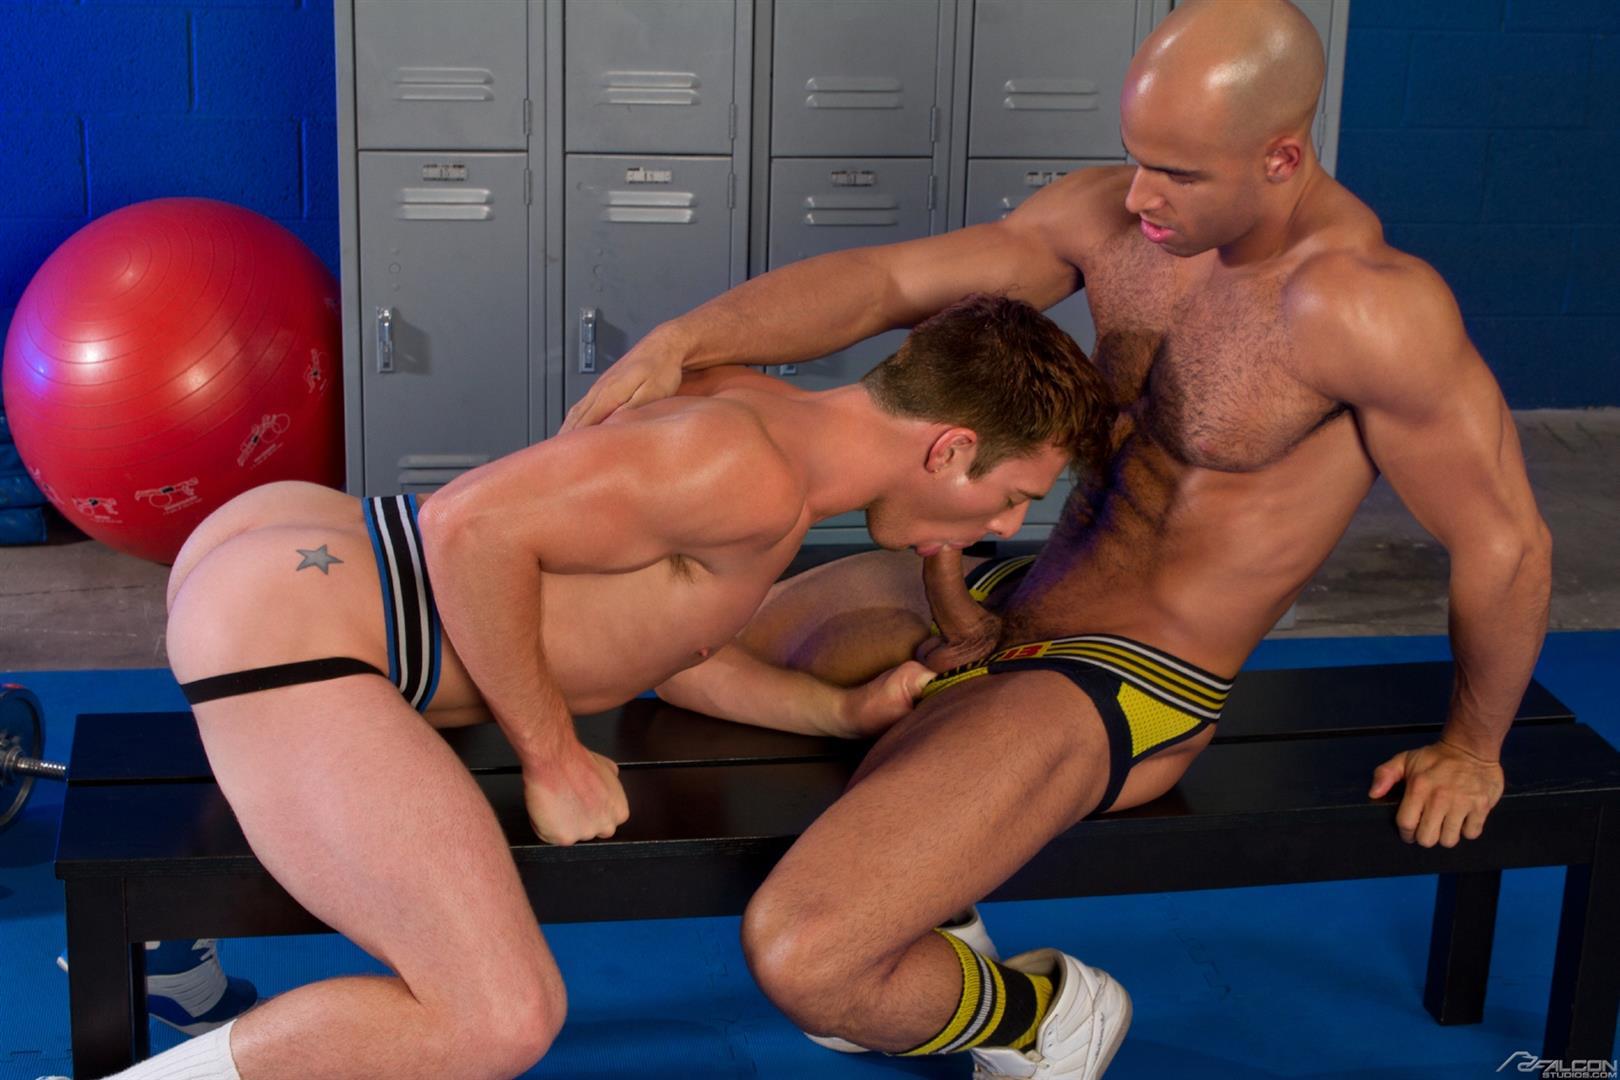 new gay retire jpg 1200x900